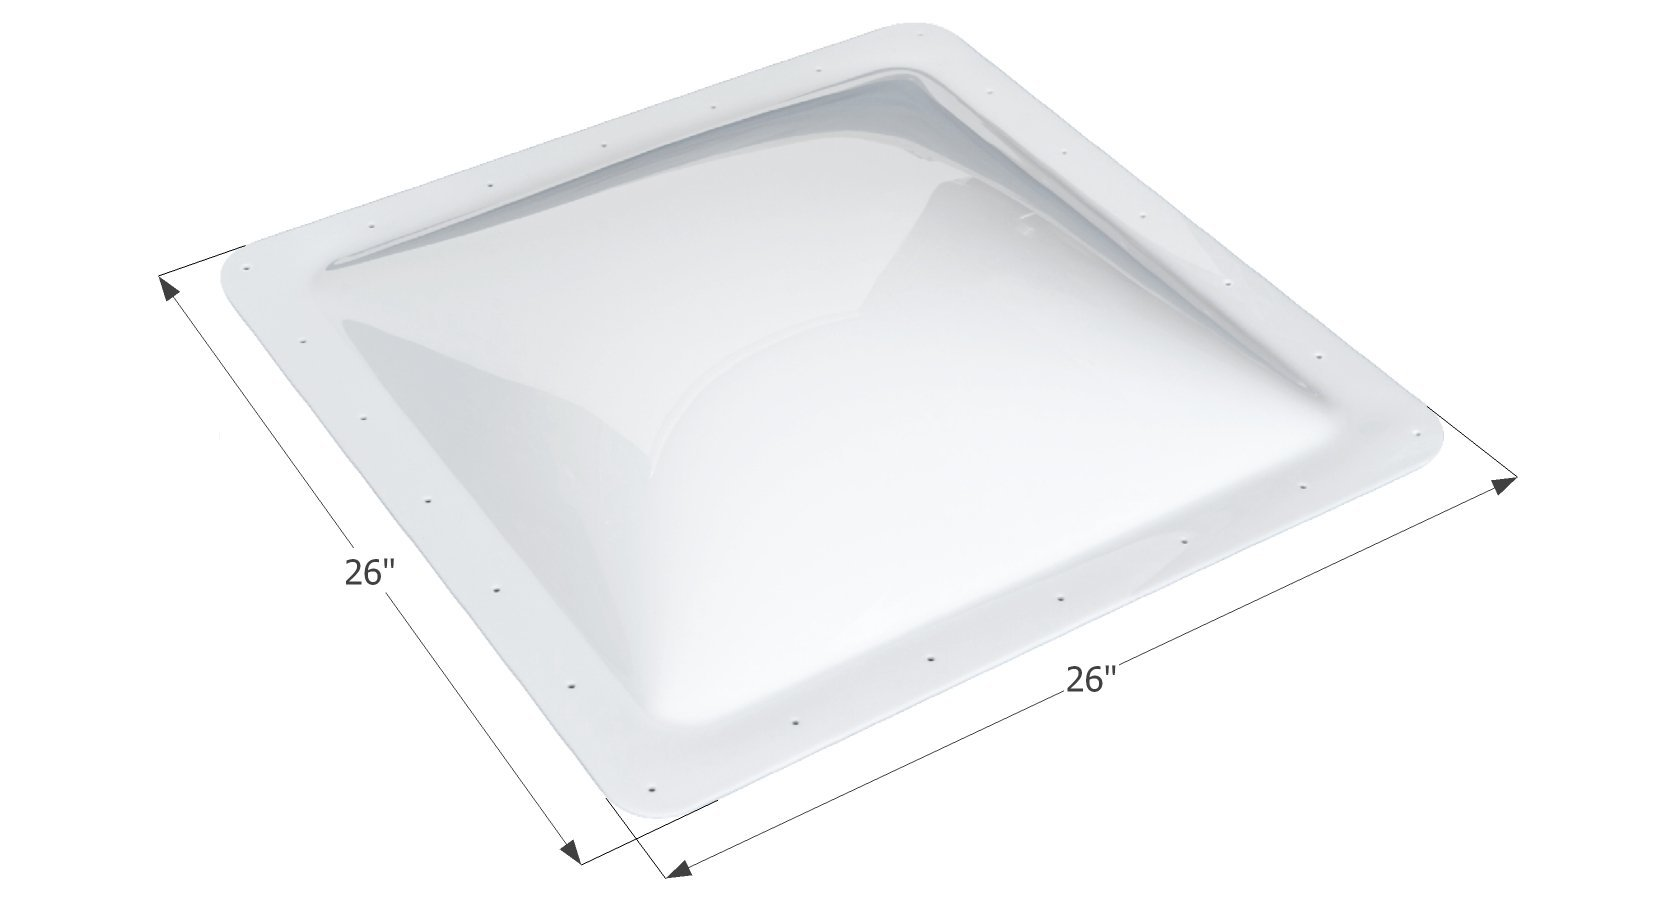 ICON 01857 RV Skylight